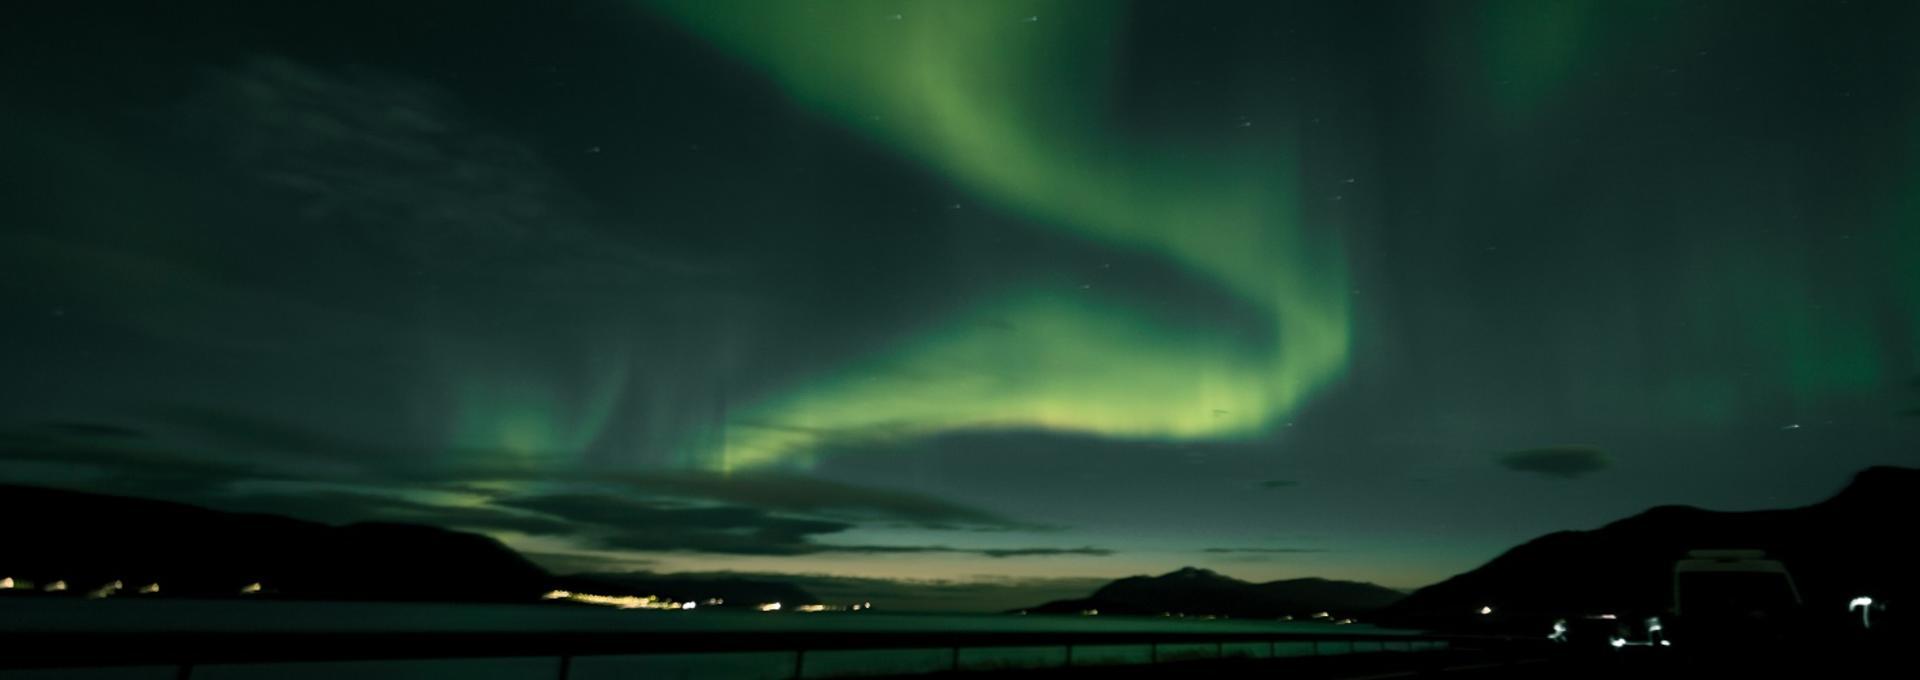 jed buencillo photography iceland akureyri blog